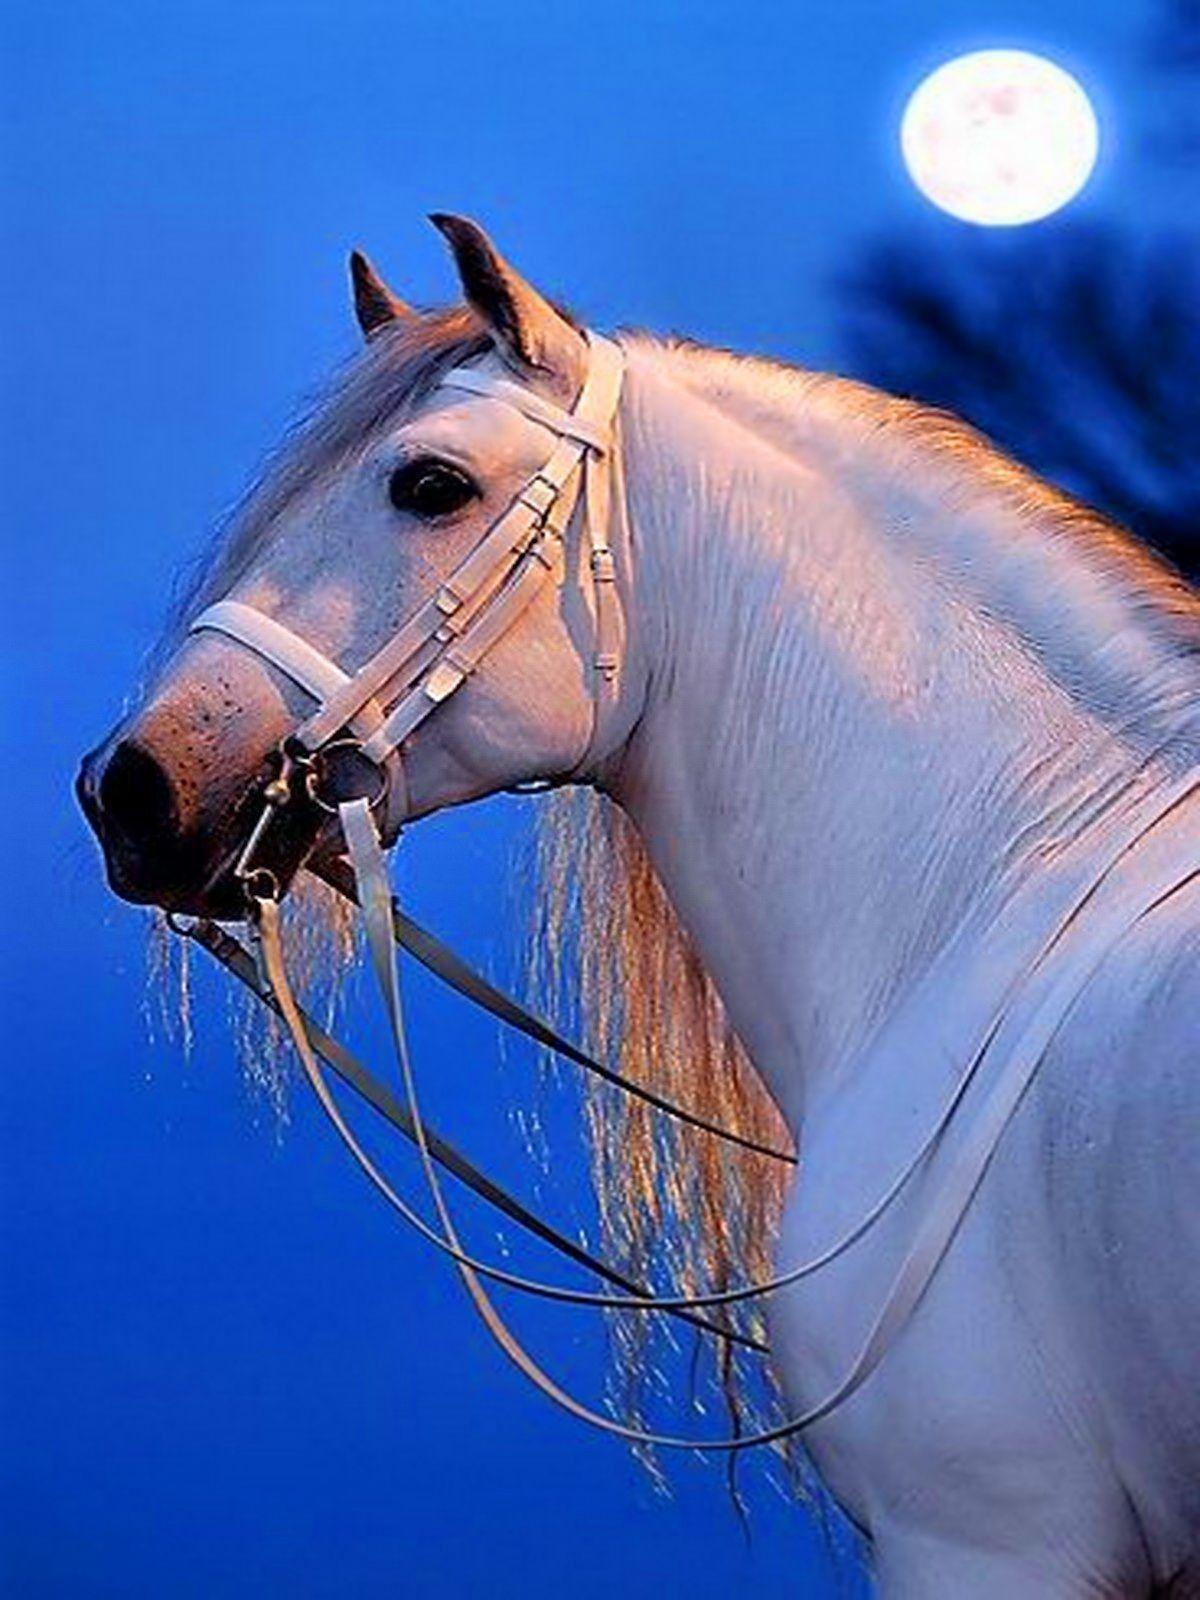 Pin by FosiiL on Vackra hästar | Animals, Horses, Pets